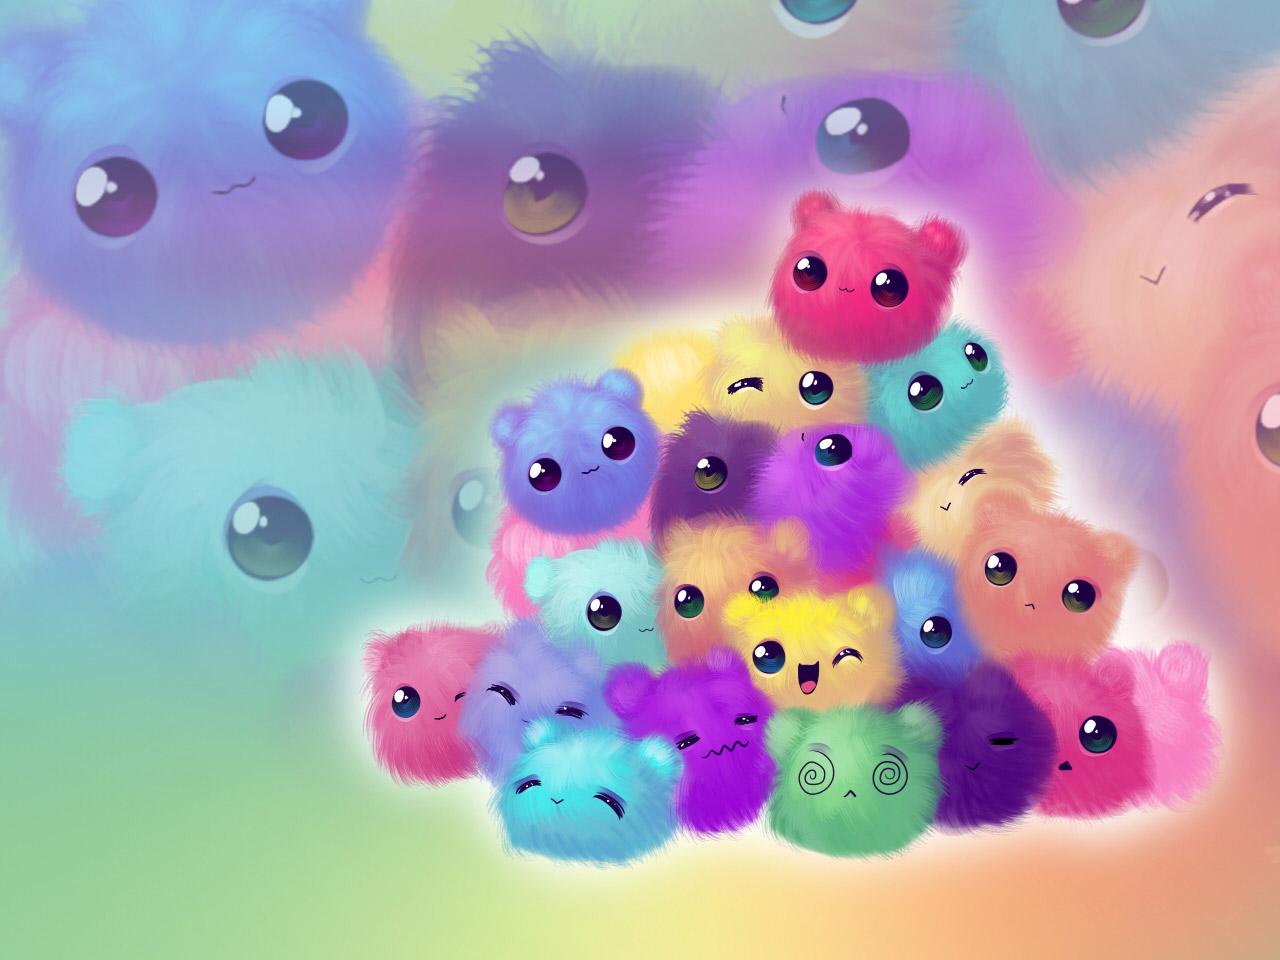 Hd wallpaper cute - Walpapers Curot Cute For Desktop 1280x960 Pixel Popular Hd Wallpaper